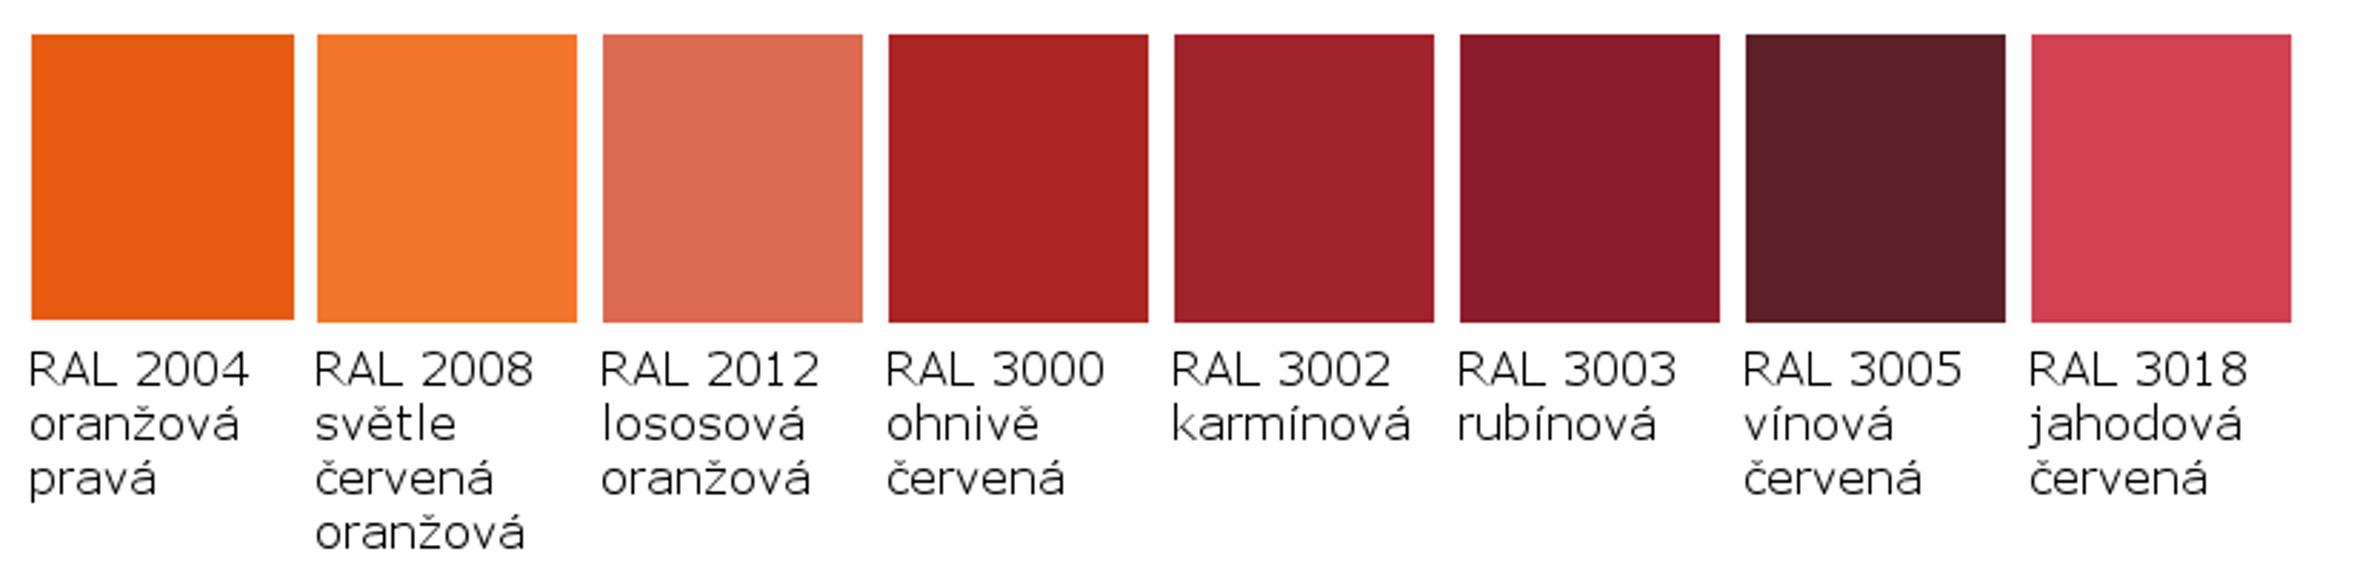 RAL 2004 - RAL 3018